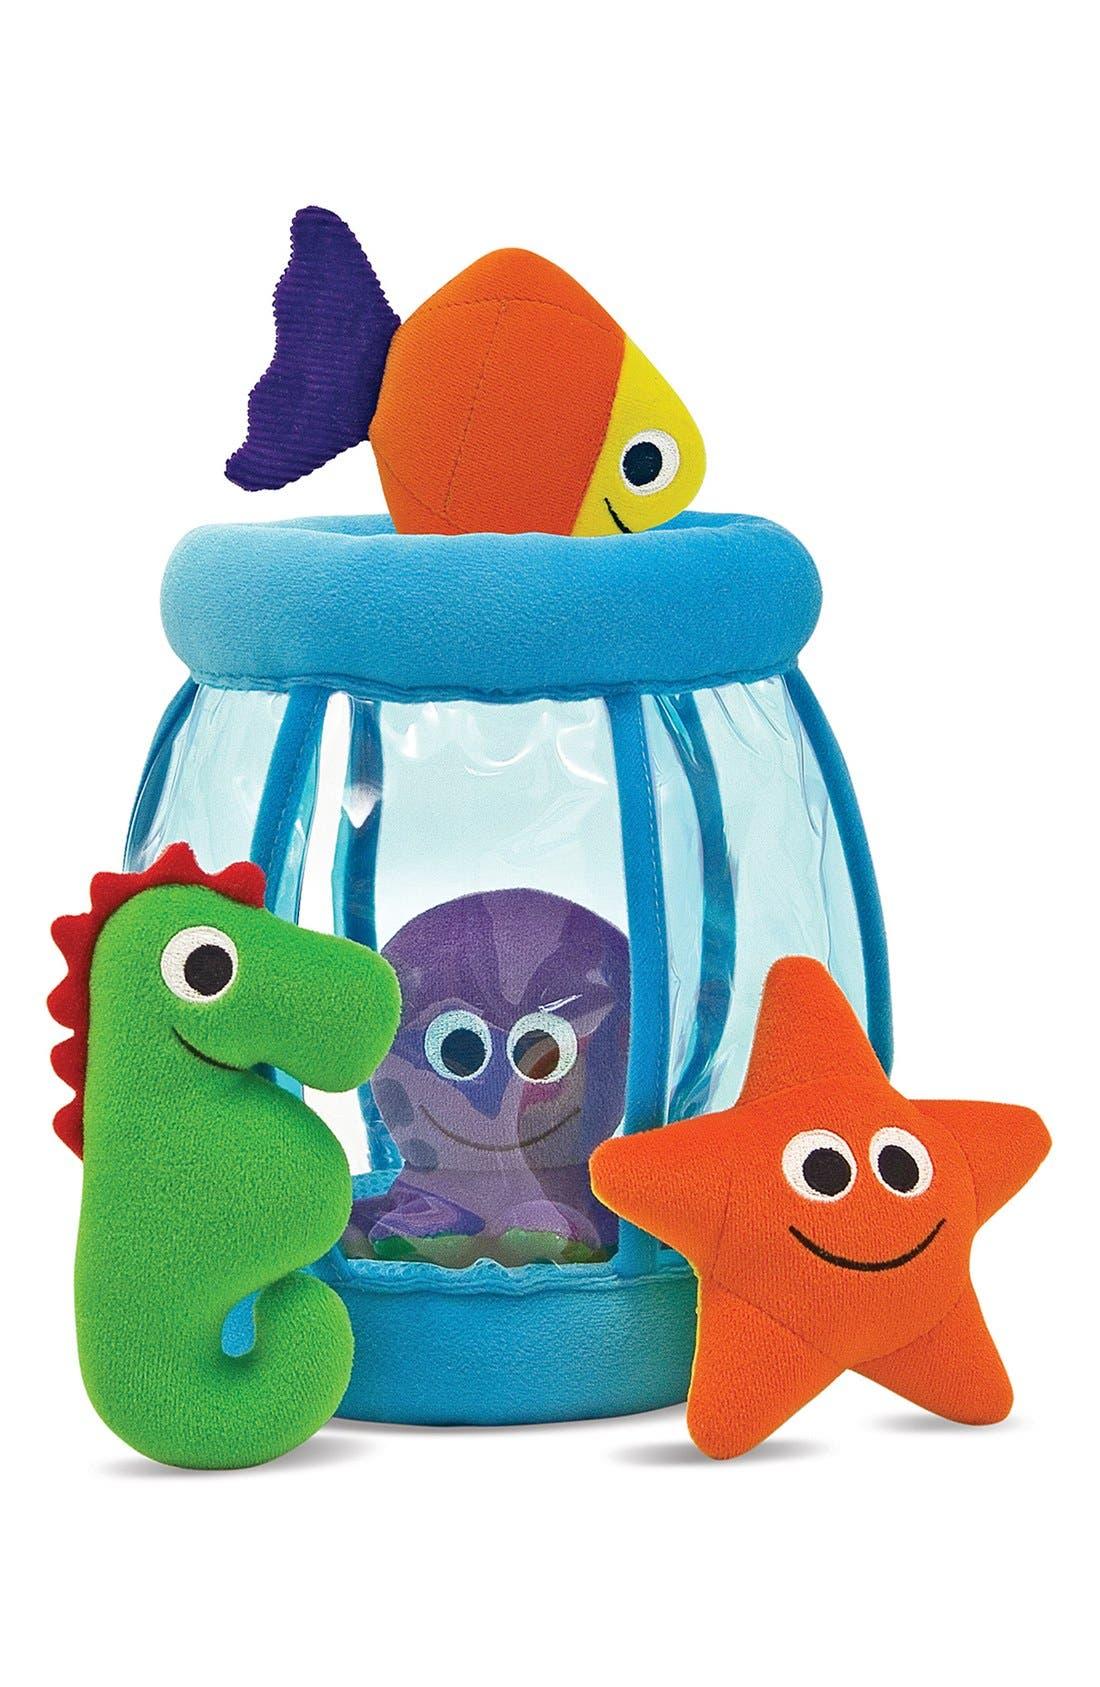 MELISSA & DOUG 'Fishbowl Fill & Spill' Game